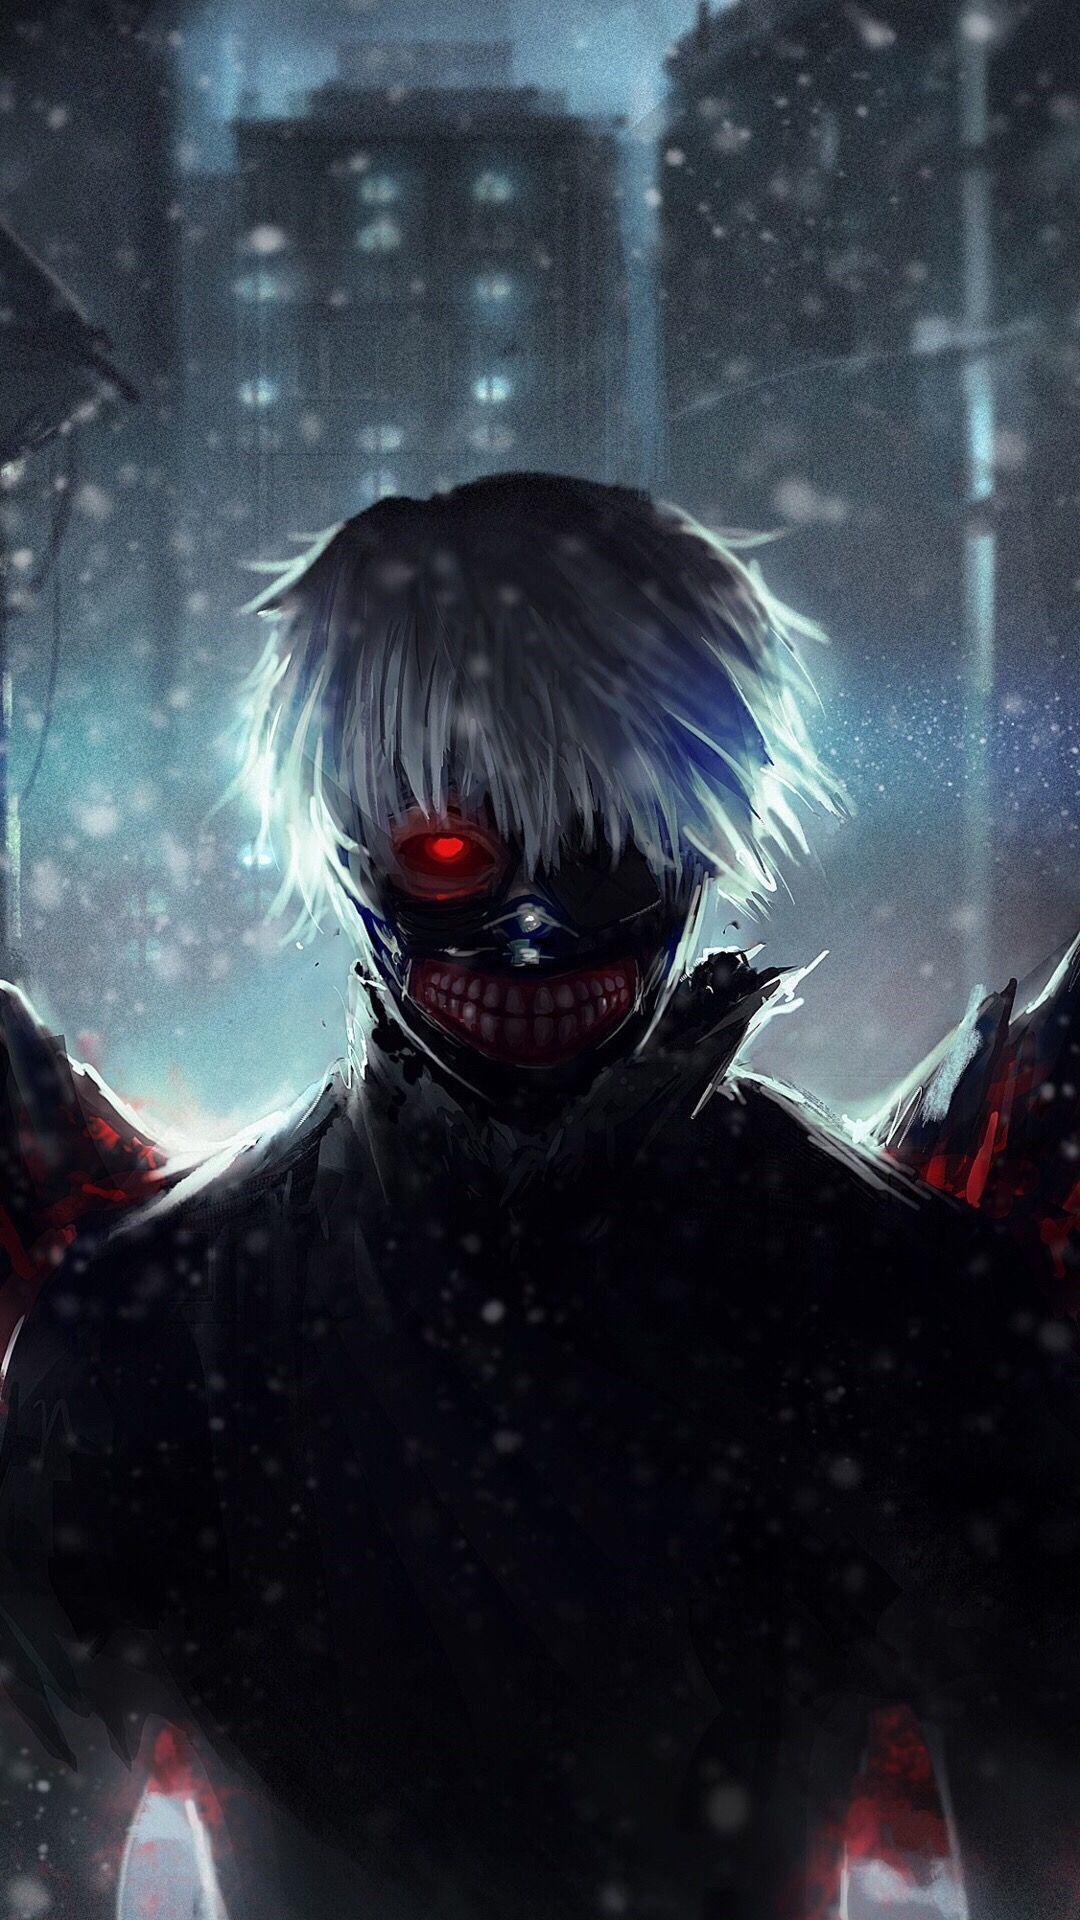 Tokyo Ghoul Hd Wallpaper For Android Tokyo ghoul, Gambar